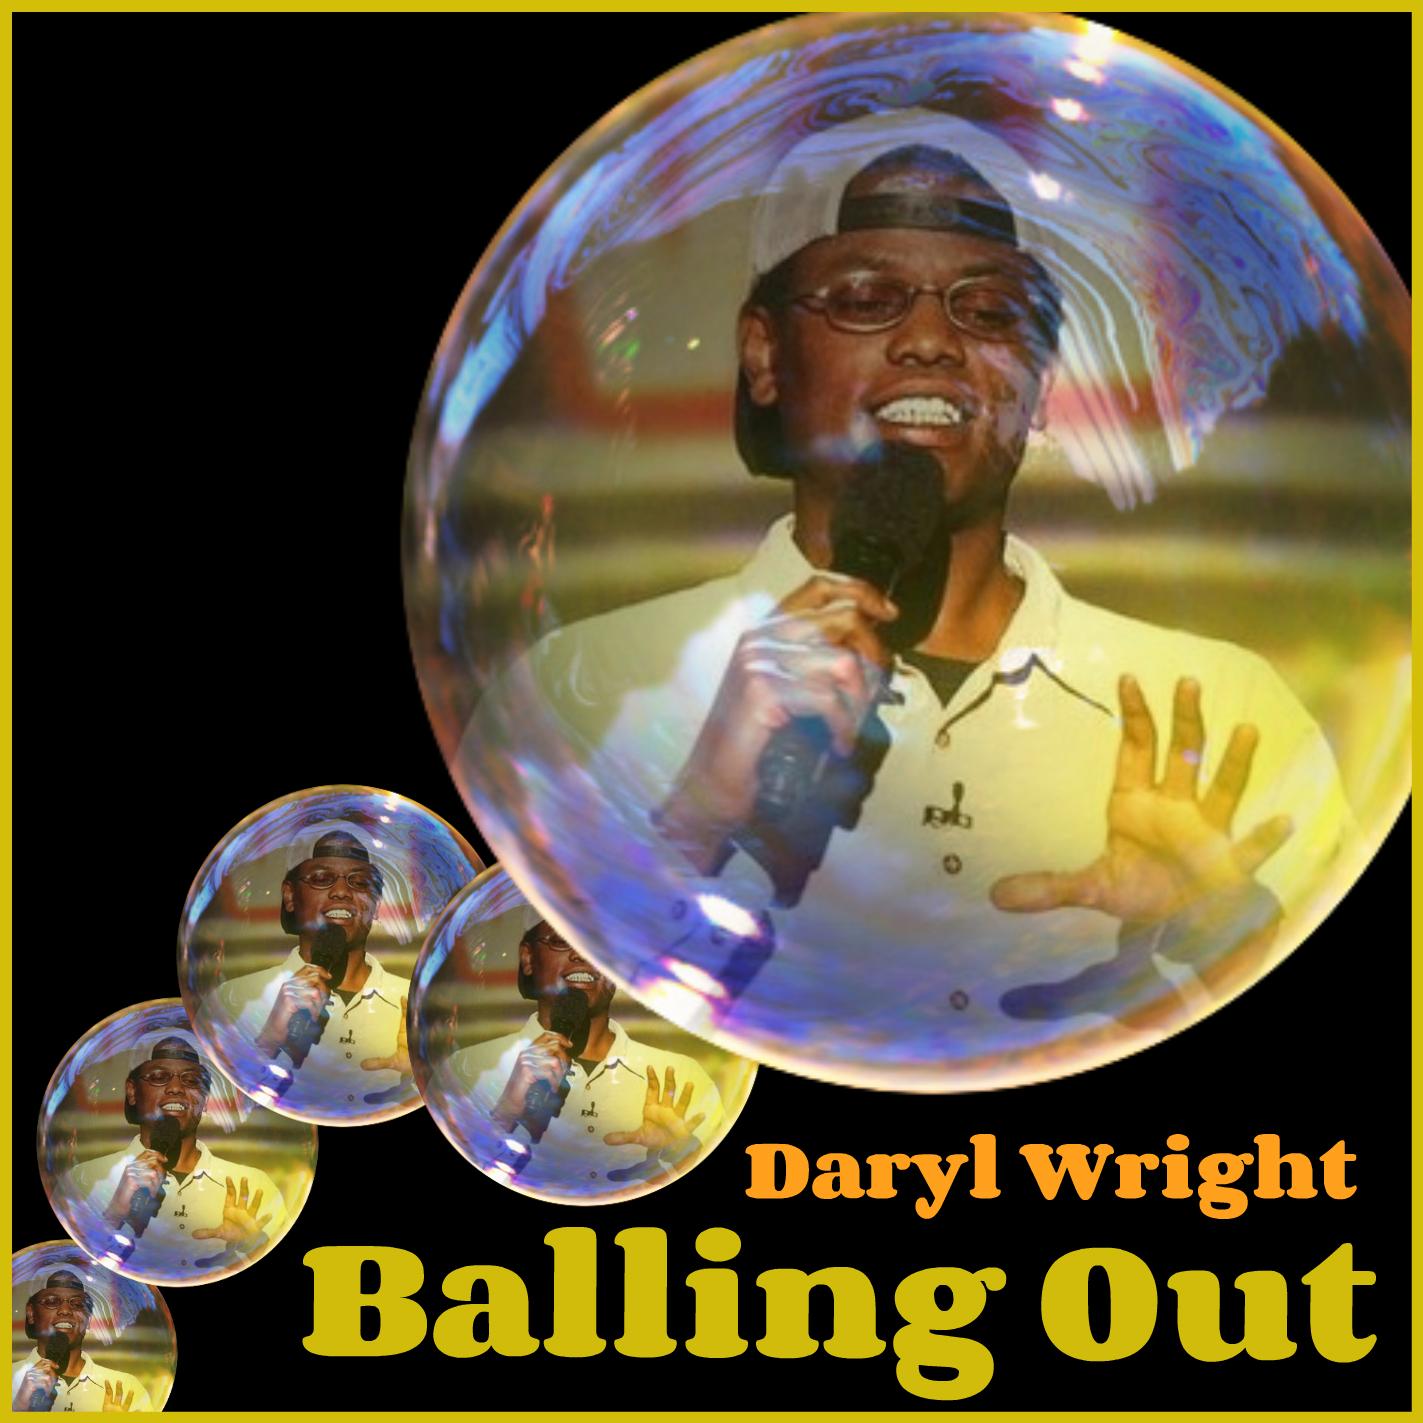 BallingOut